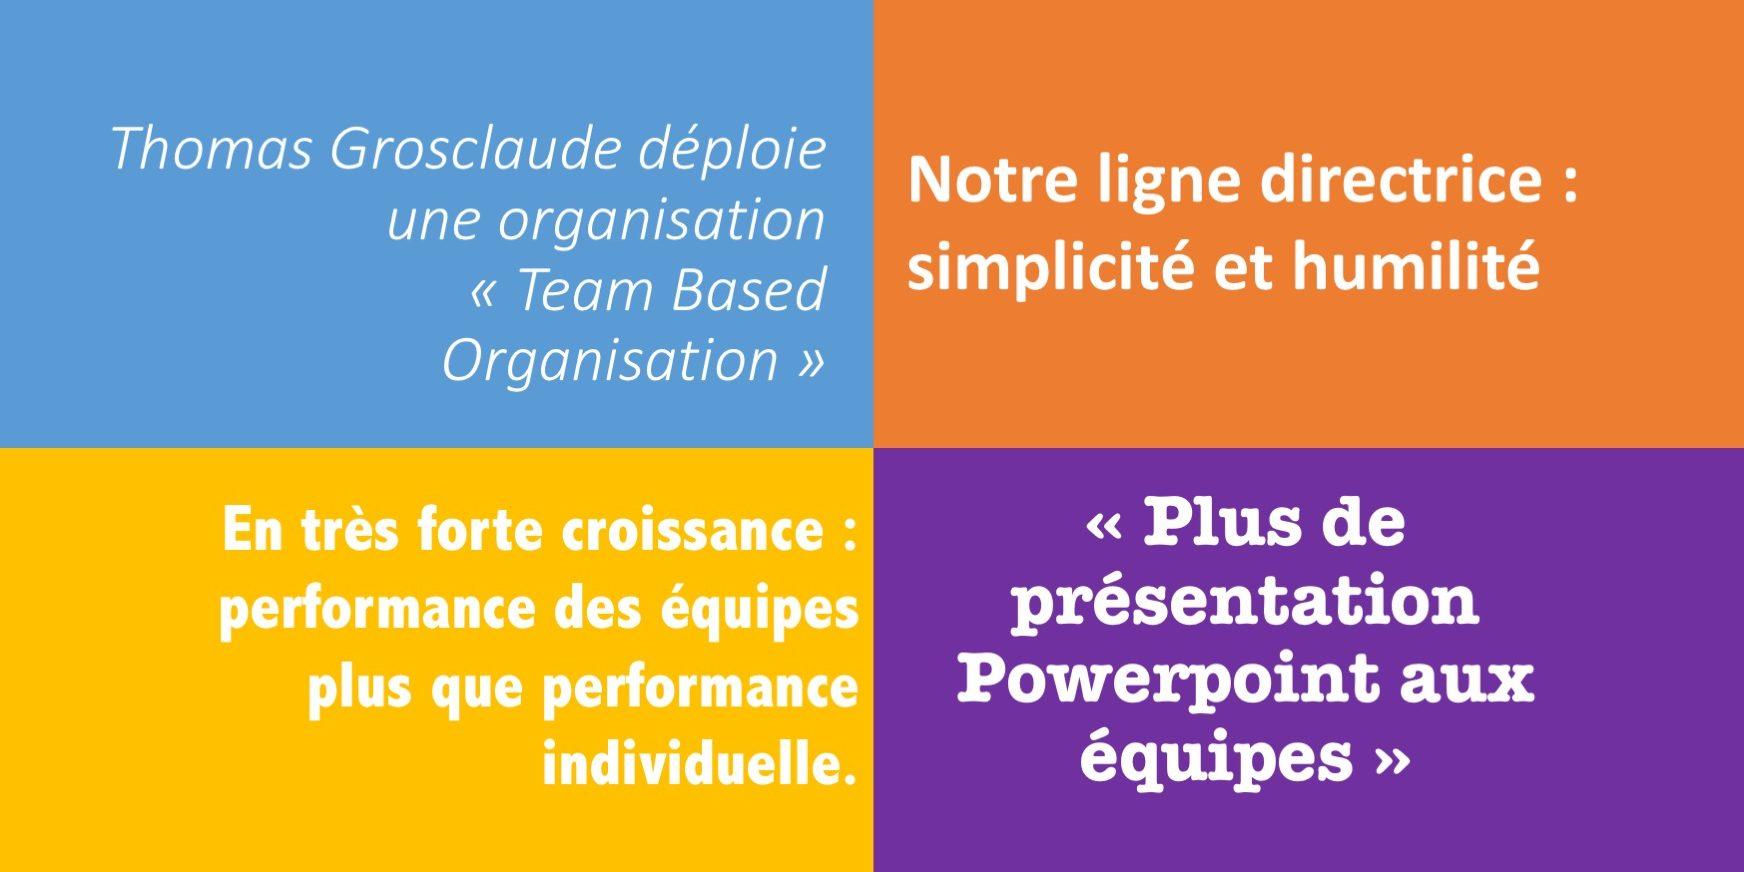 team based organization